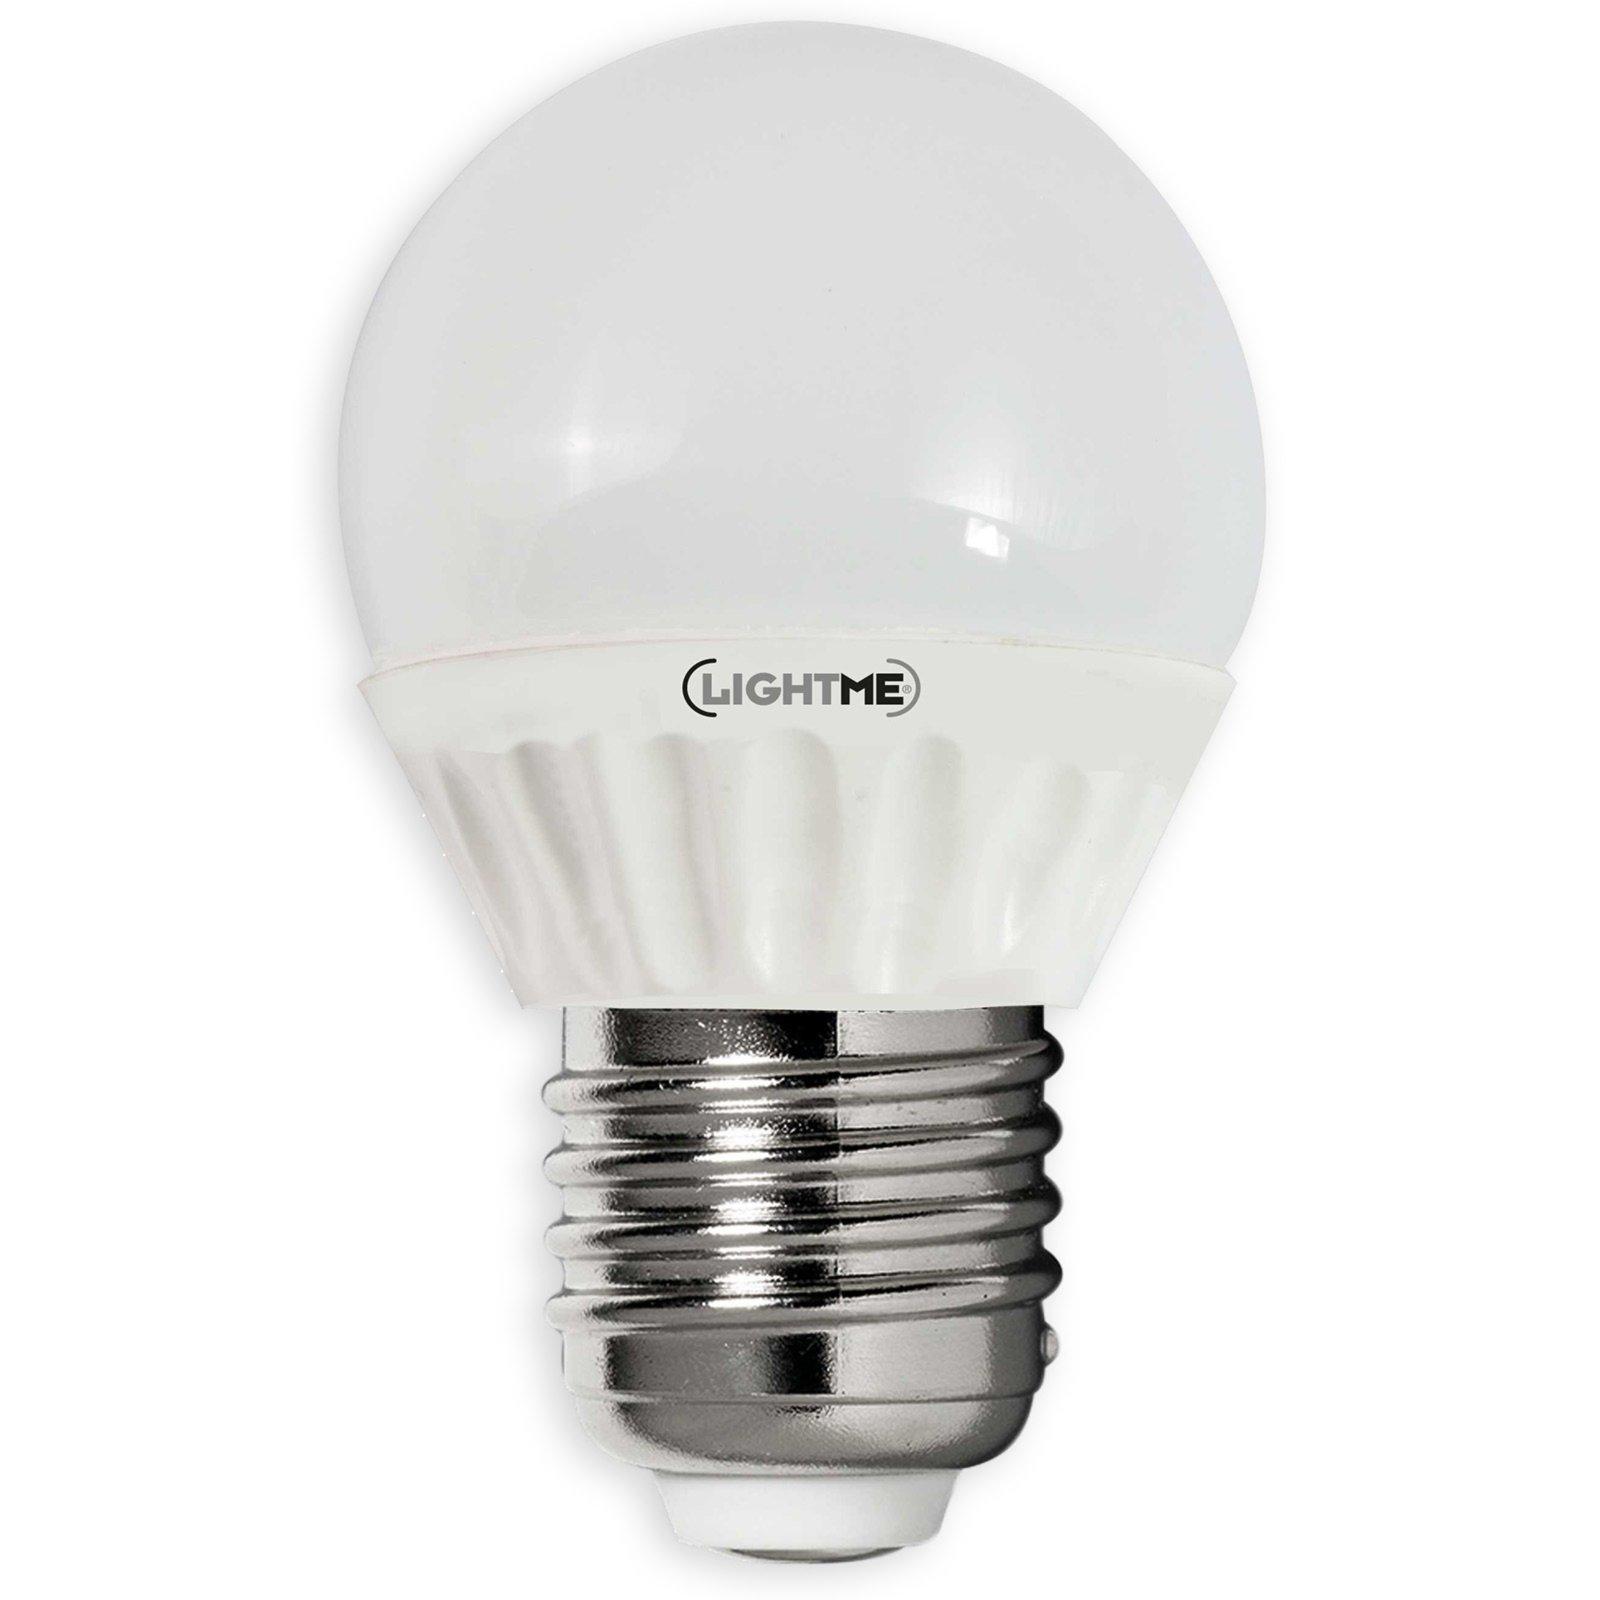 led leuchtmittel lightme tropfen e27 3 watt warmwei led leuchtmittel leuchtmittel. Black Bedroom Furniture Sets. Home Design Ideas